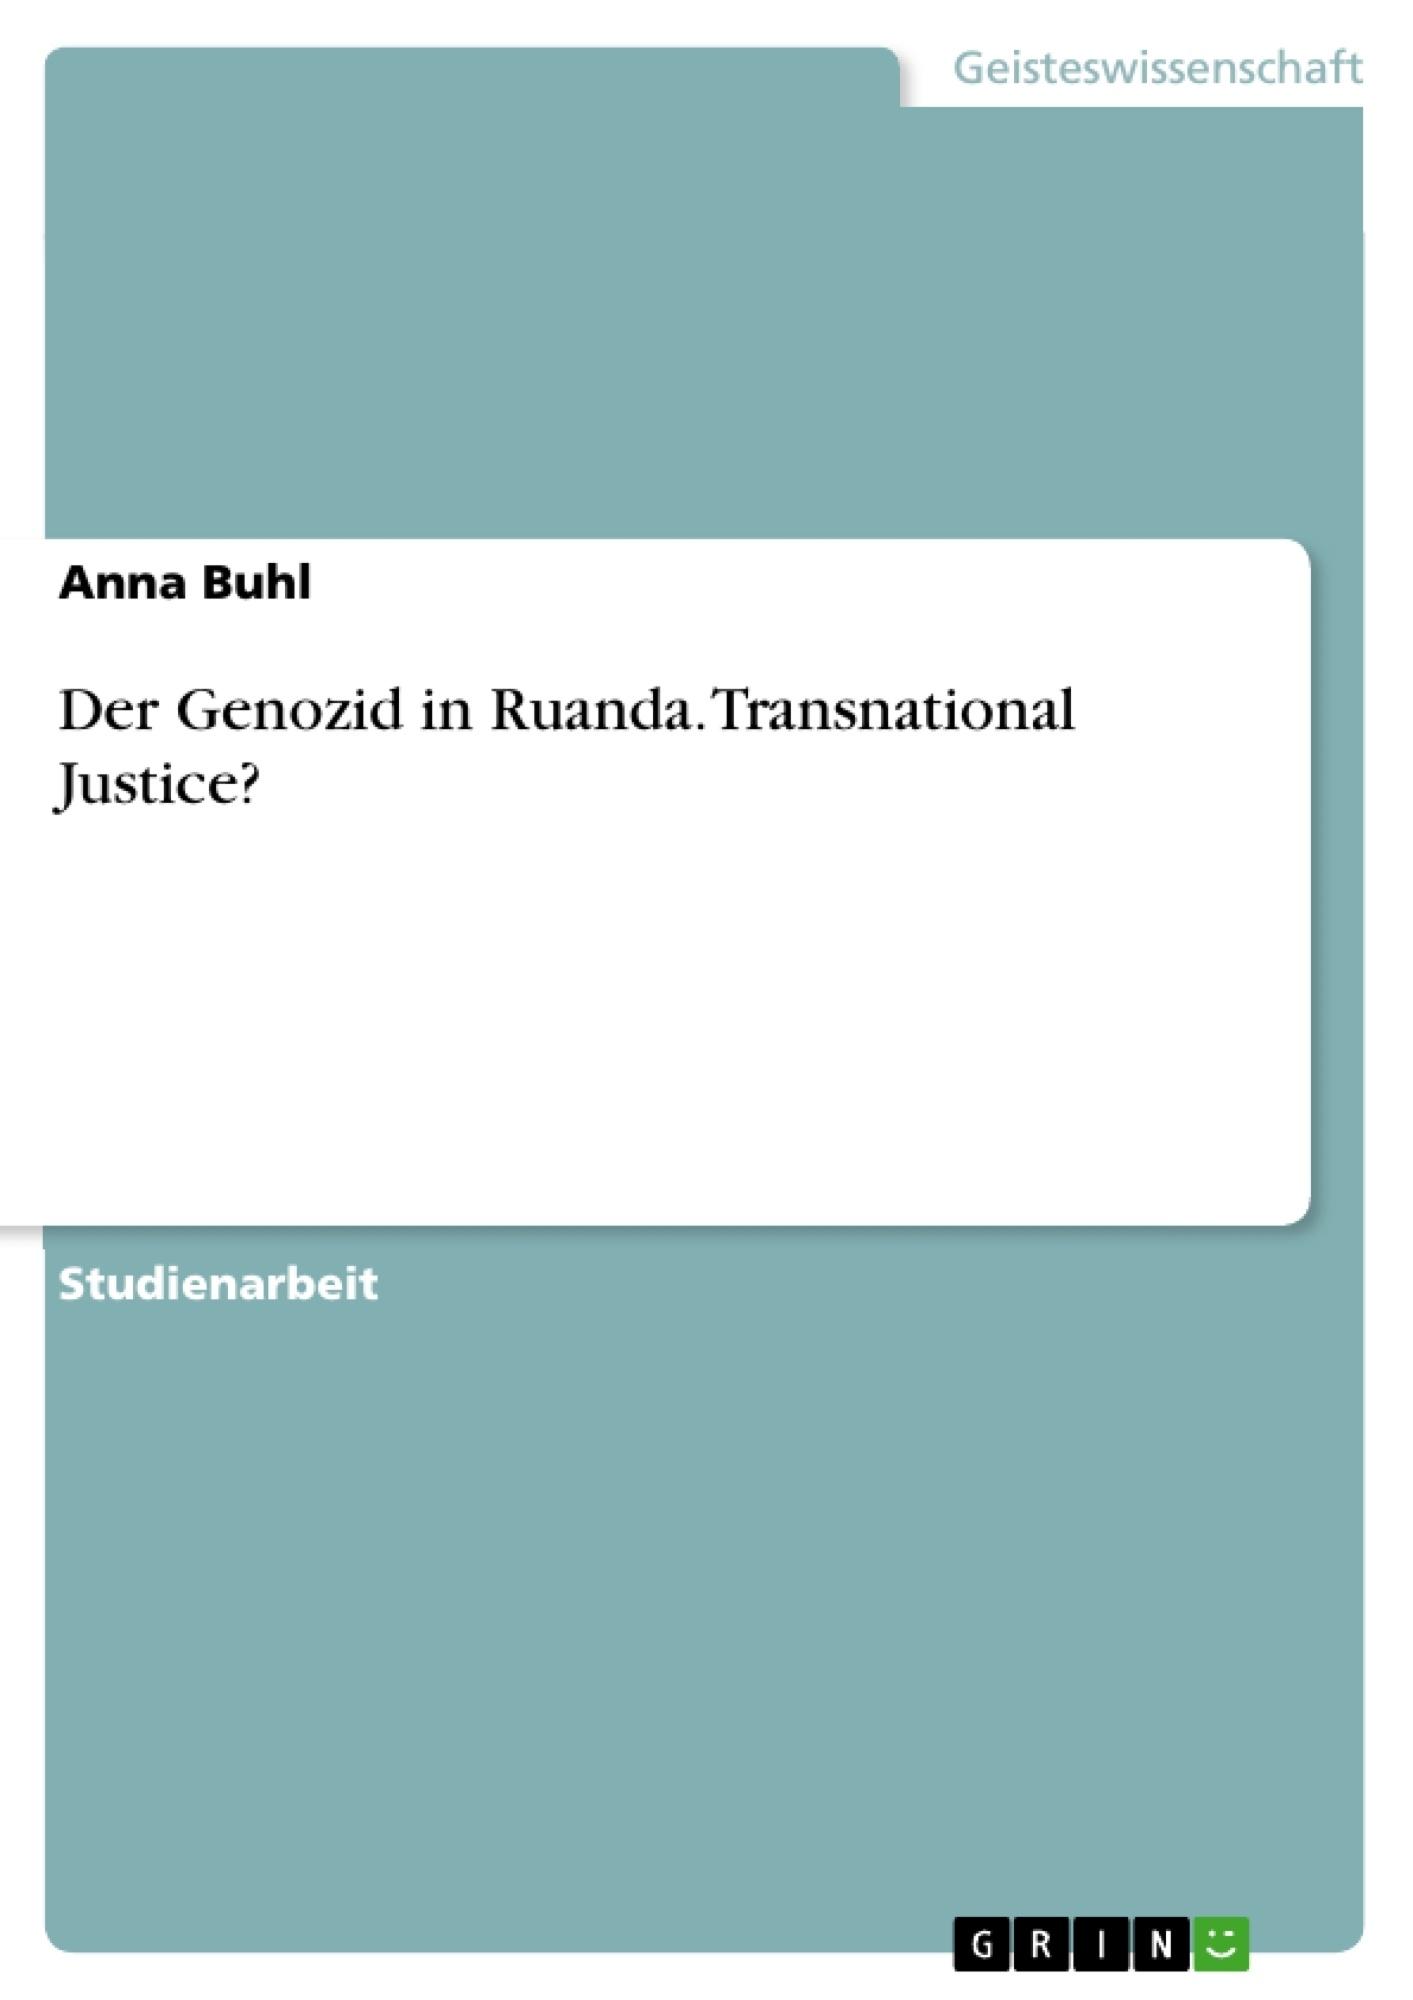 Titel: Der Genozid in Ruanda. Transnational Justice?